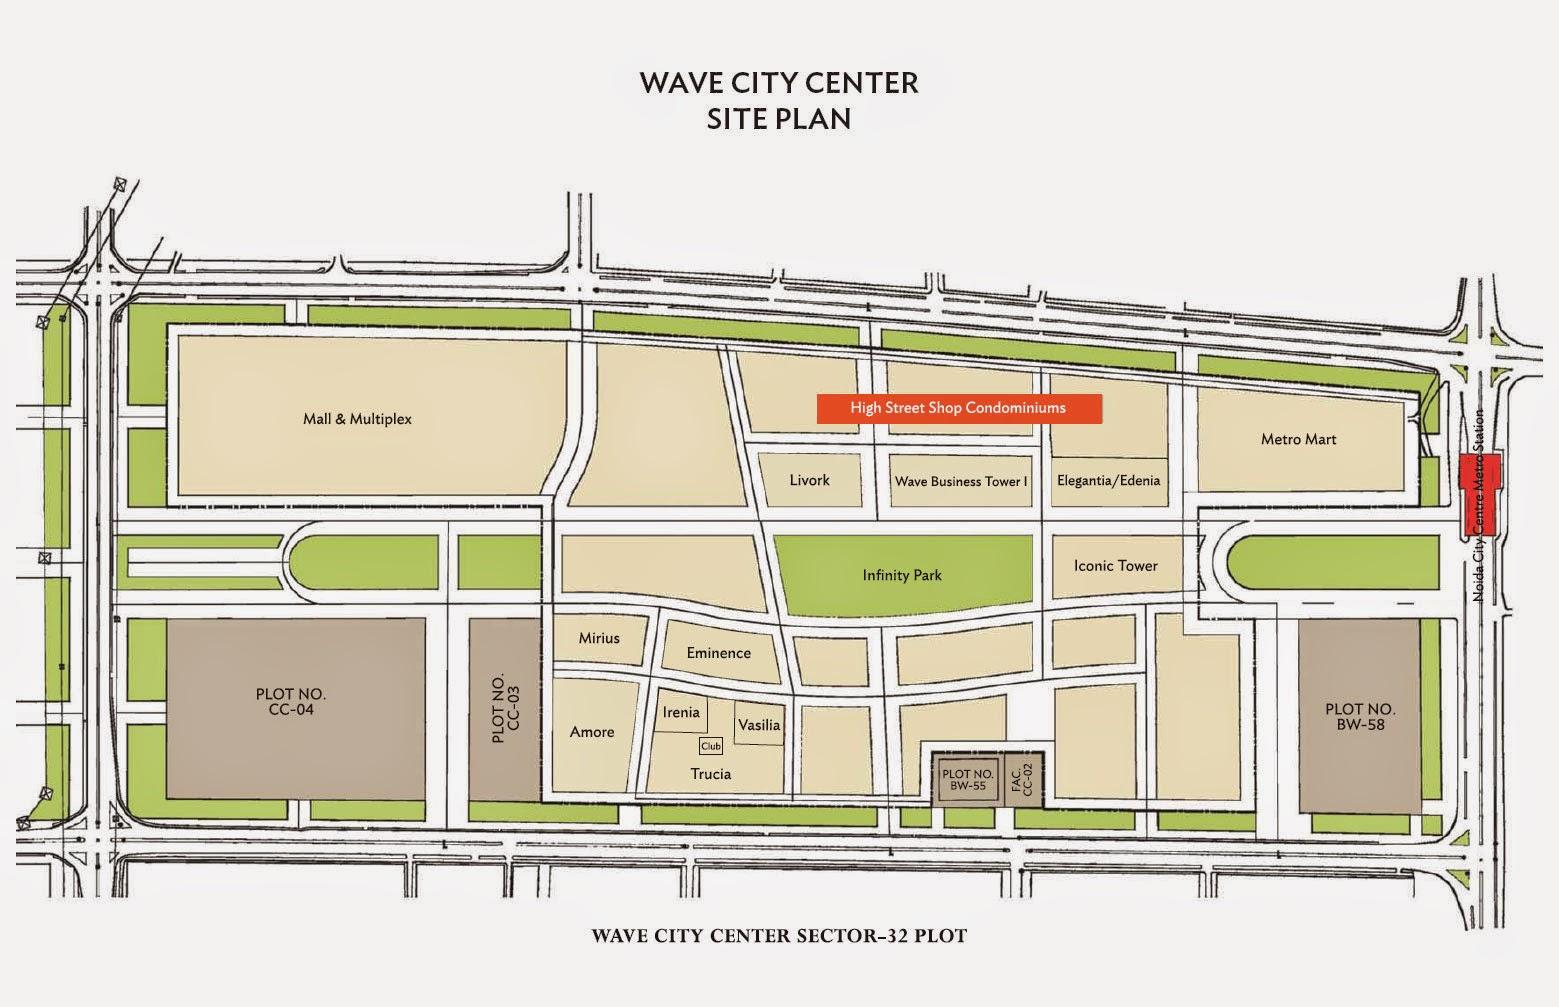 Site Plan of High Street Shop Condominiums